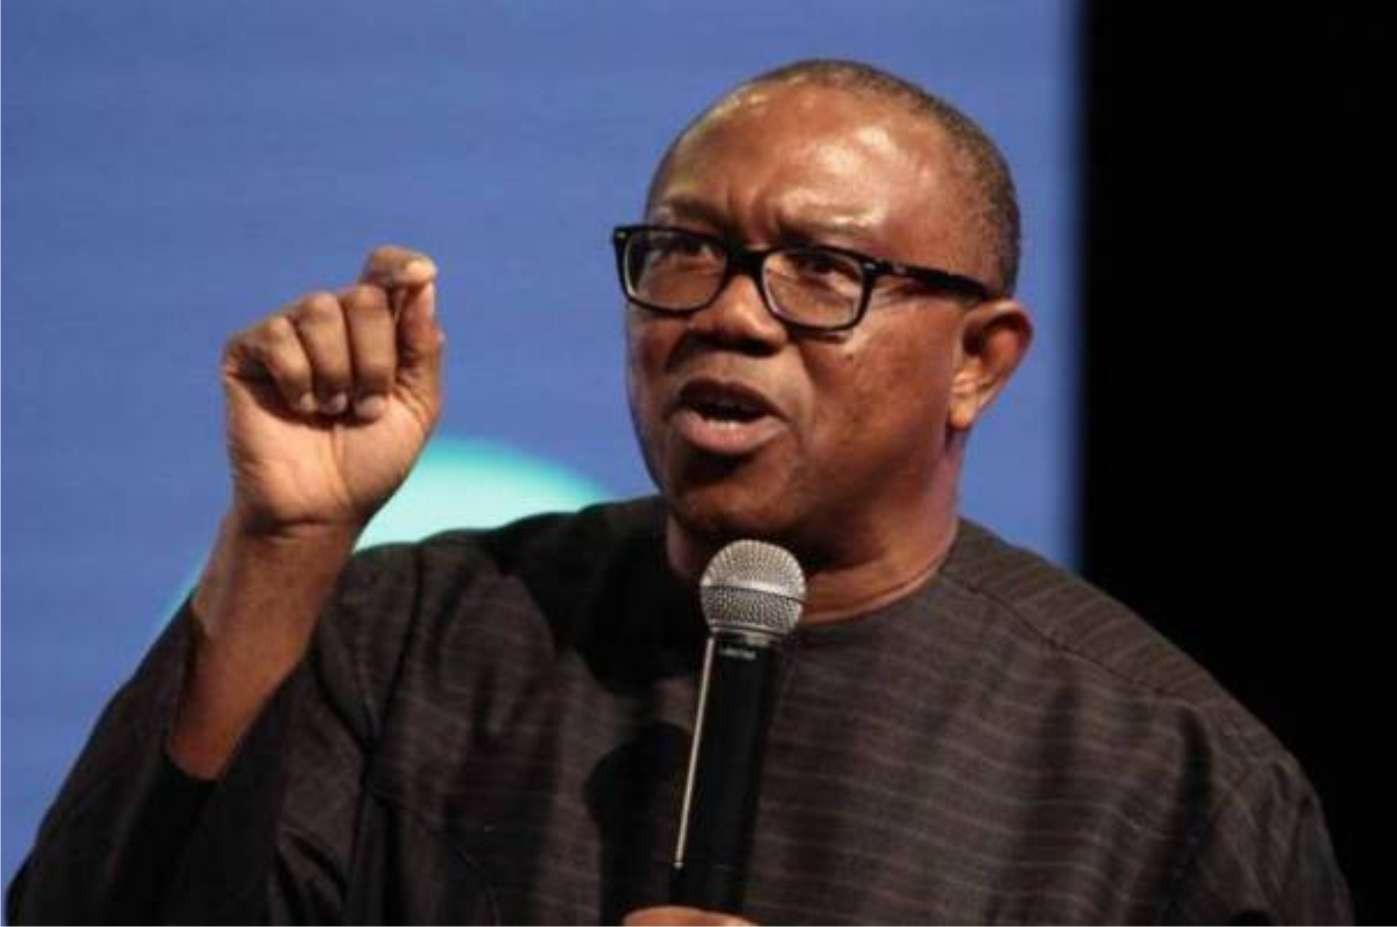 Nigeria will have 110m poor people by end of 2020 Peter Obi lindaikejisblog